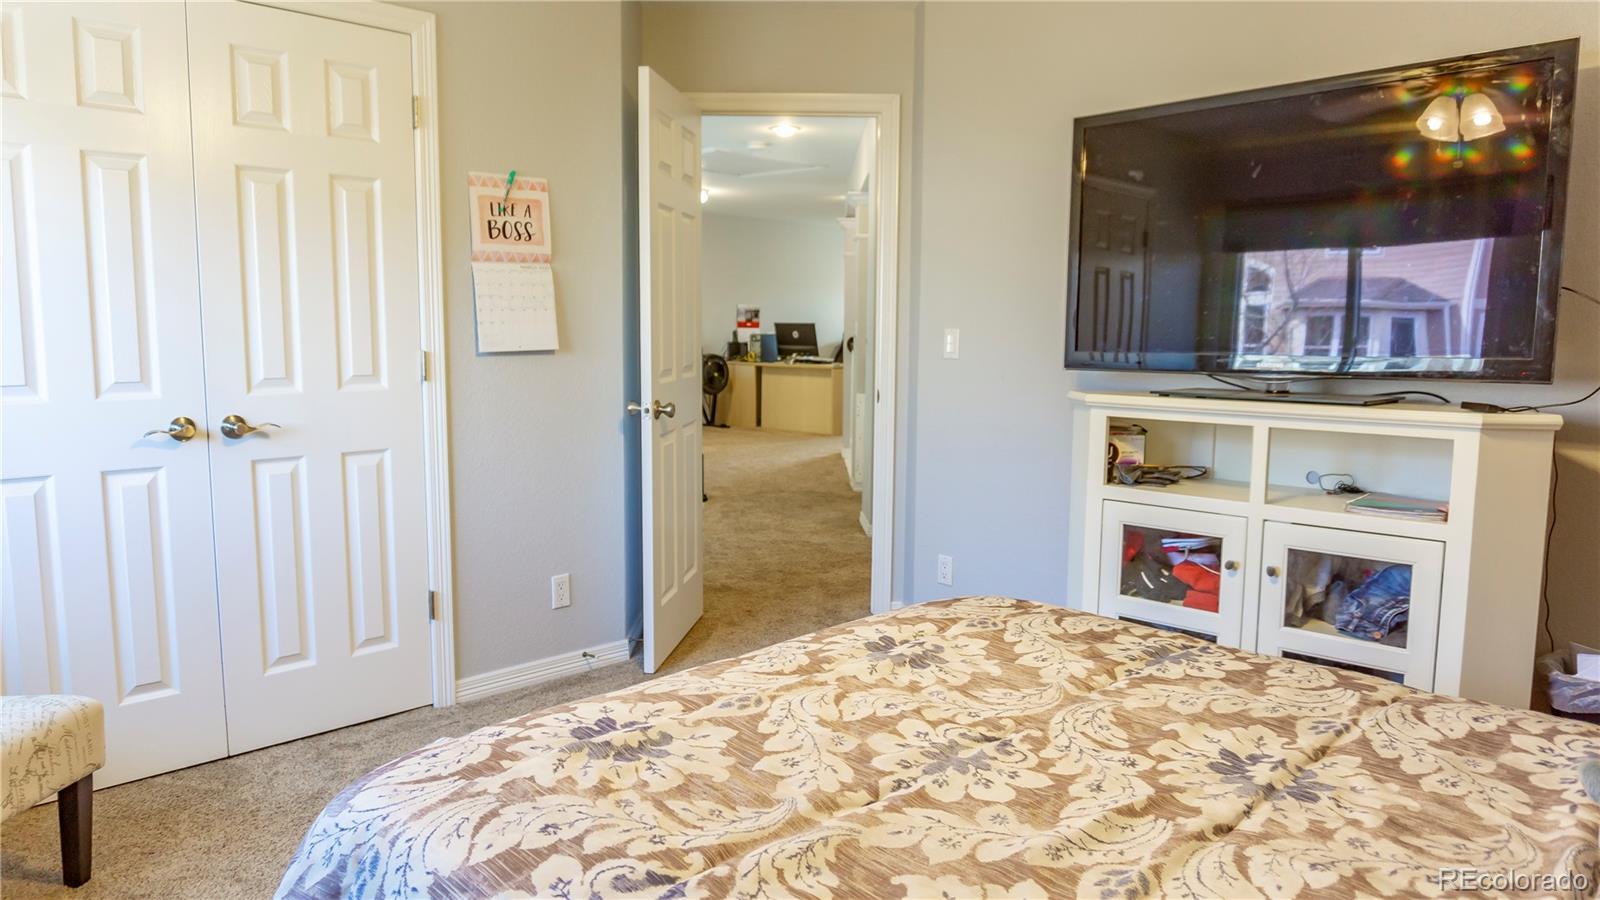 MLS# 7352042 - 14 - 240 Sylvestor Place, Highlands Ranch, CO 80129